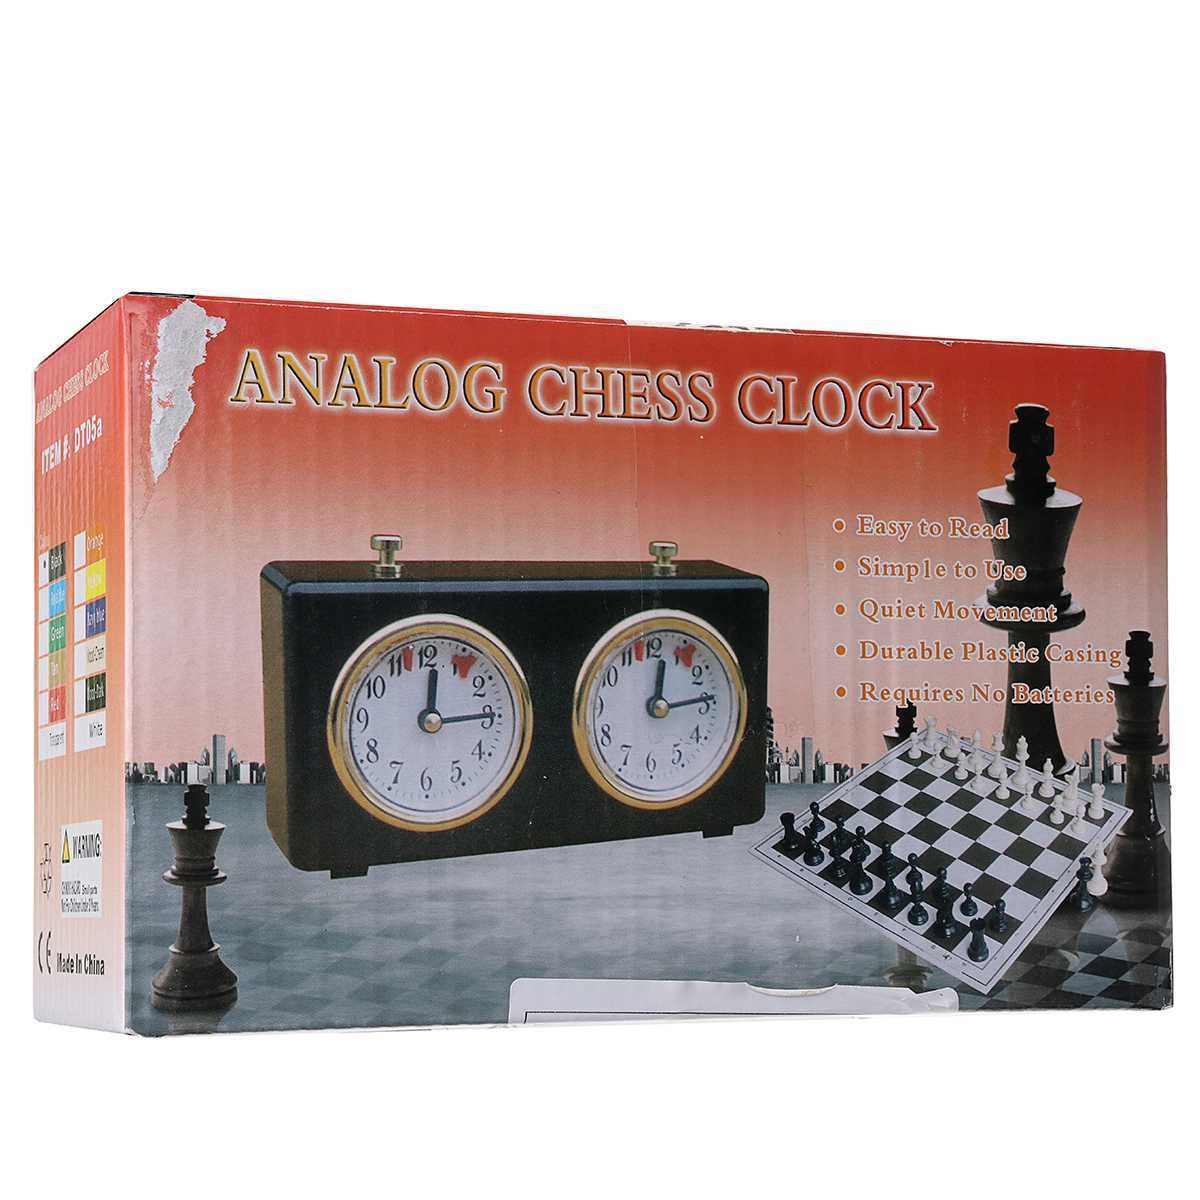 Professional LEAP DT05ah Analog หมากรุกนาฬิกาสำหรับหมากรุก/I-GO Count UP Down ALARM TIMER สำหรับการแข่งขันเกมโลหะ